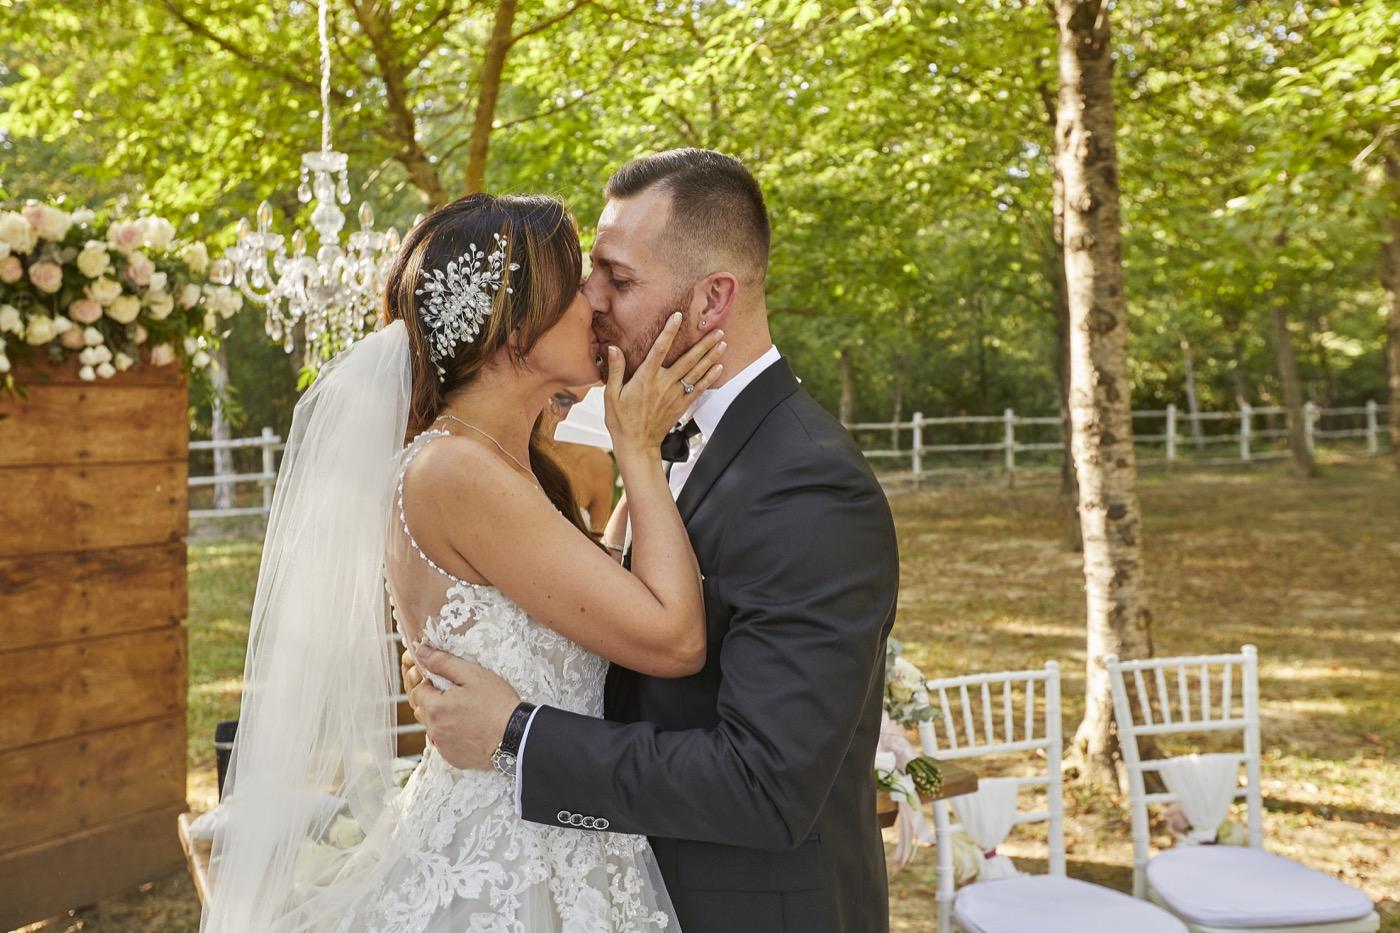 Claudio-Coppola-wedding-photographer-la-scuderia-eventi-preparativi-la-rosetta-perugia-61